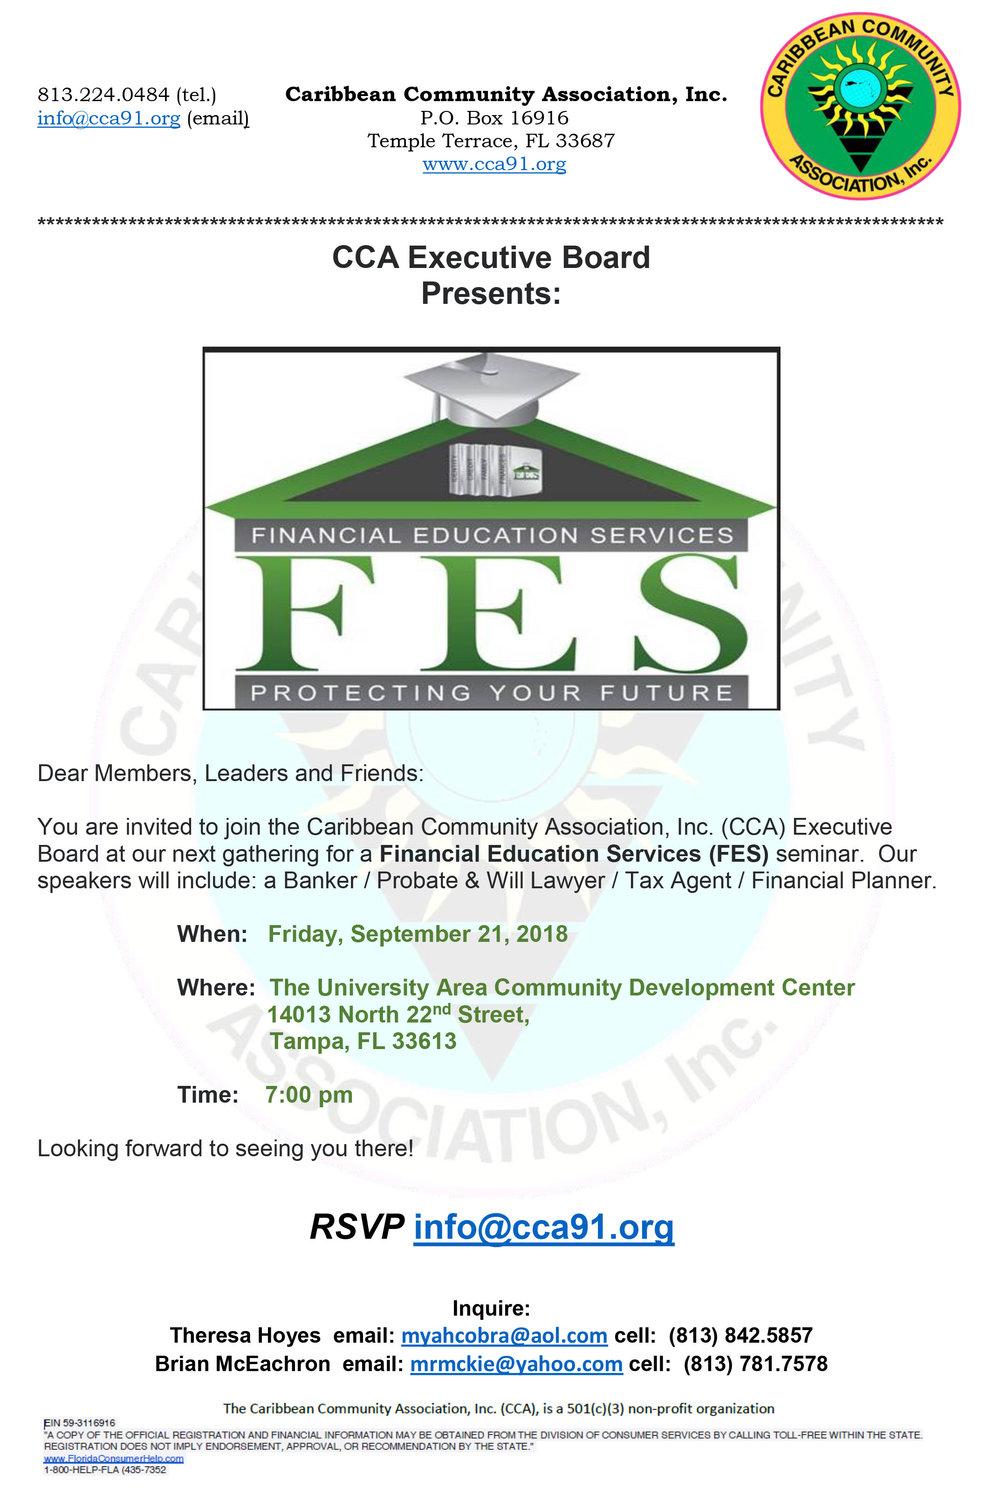 2018-Financial-Education-Services-Forum-Invitation.jpg